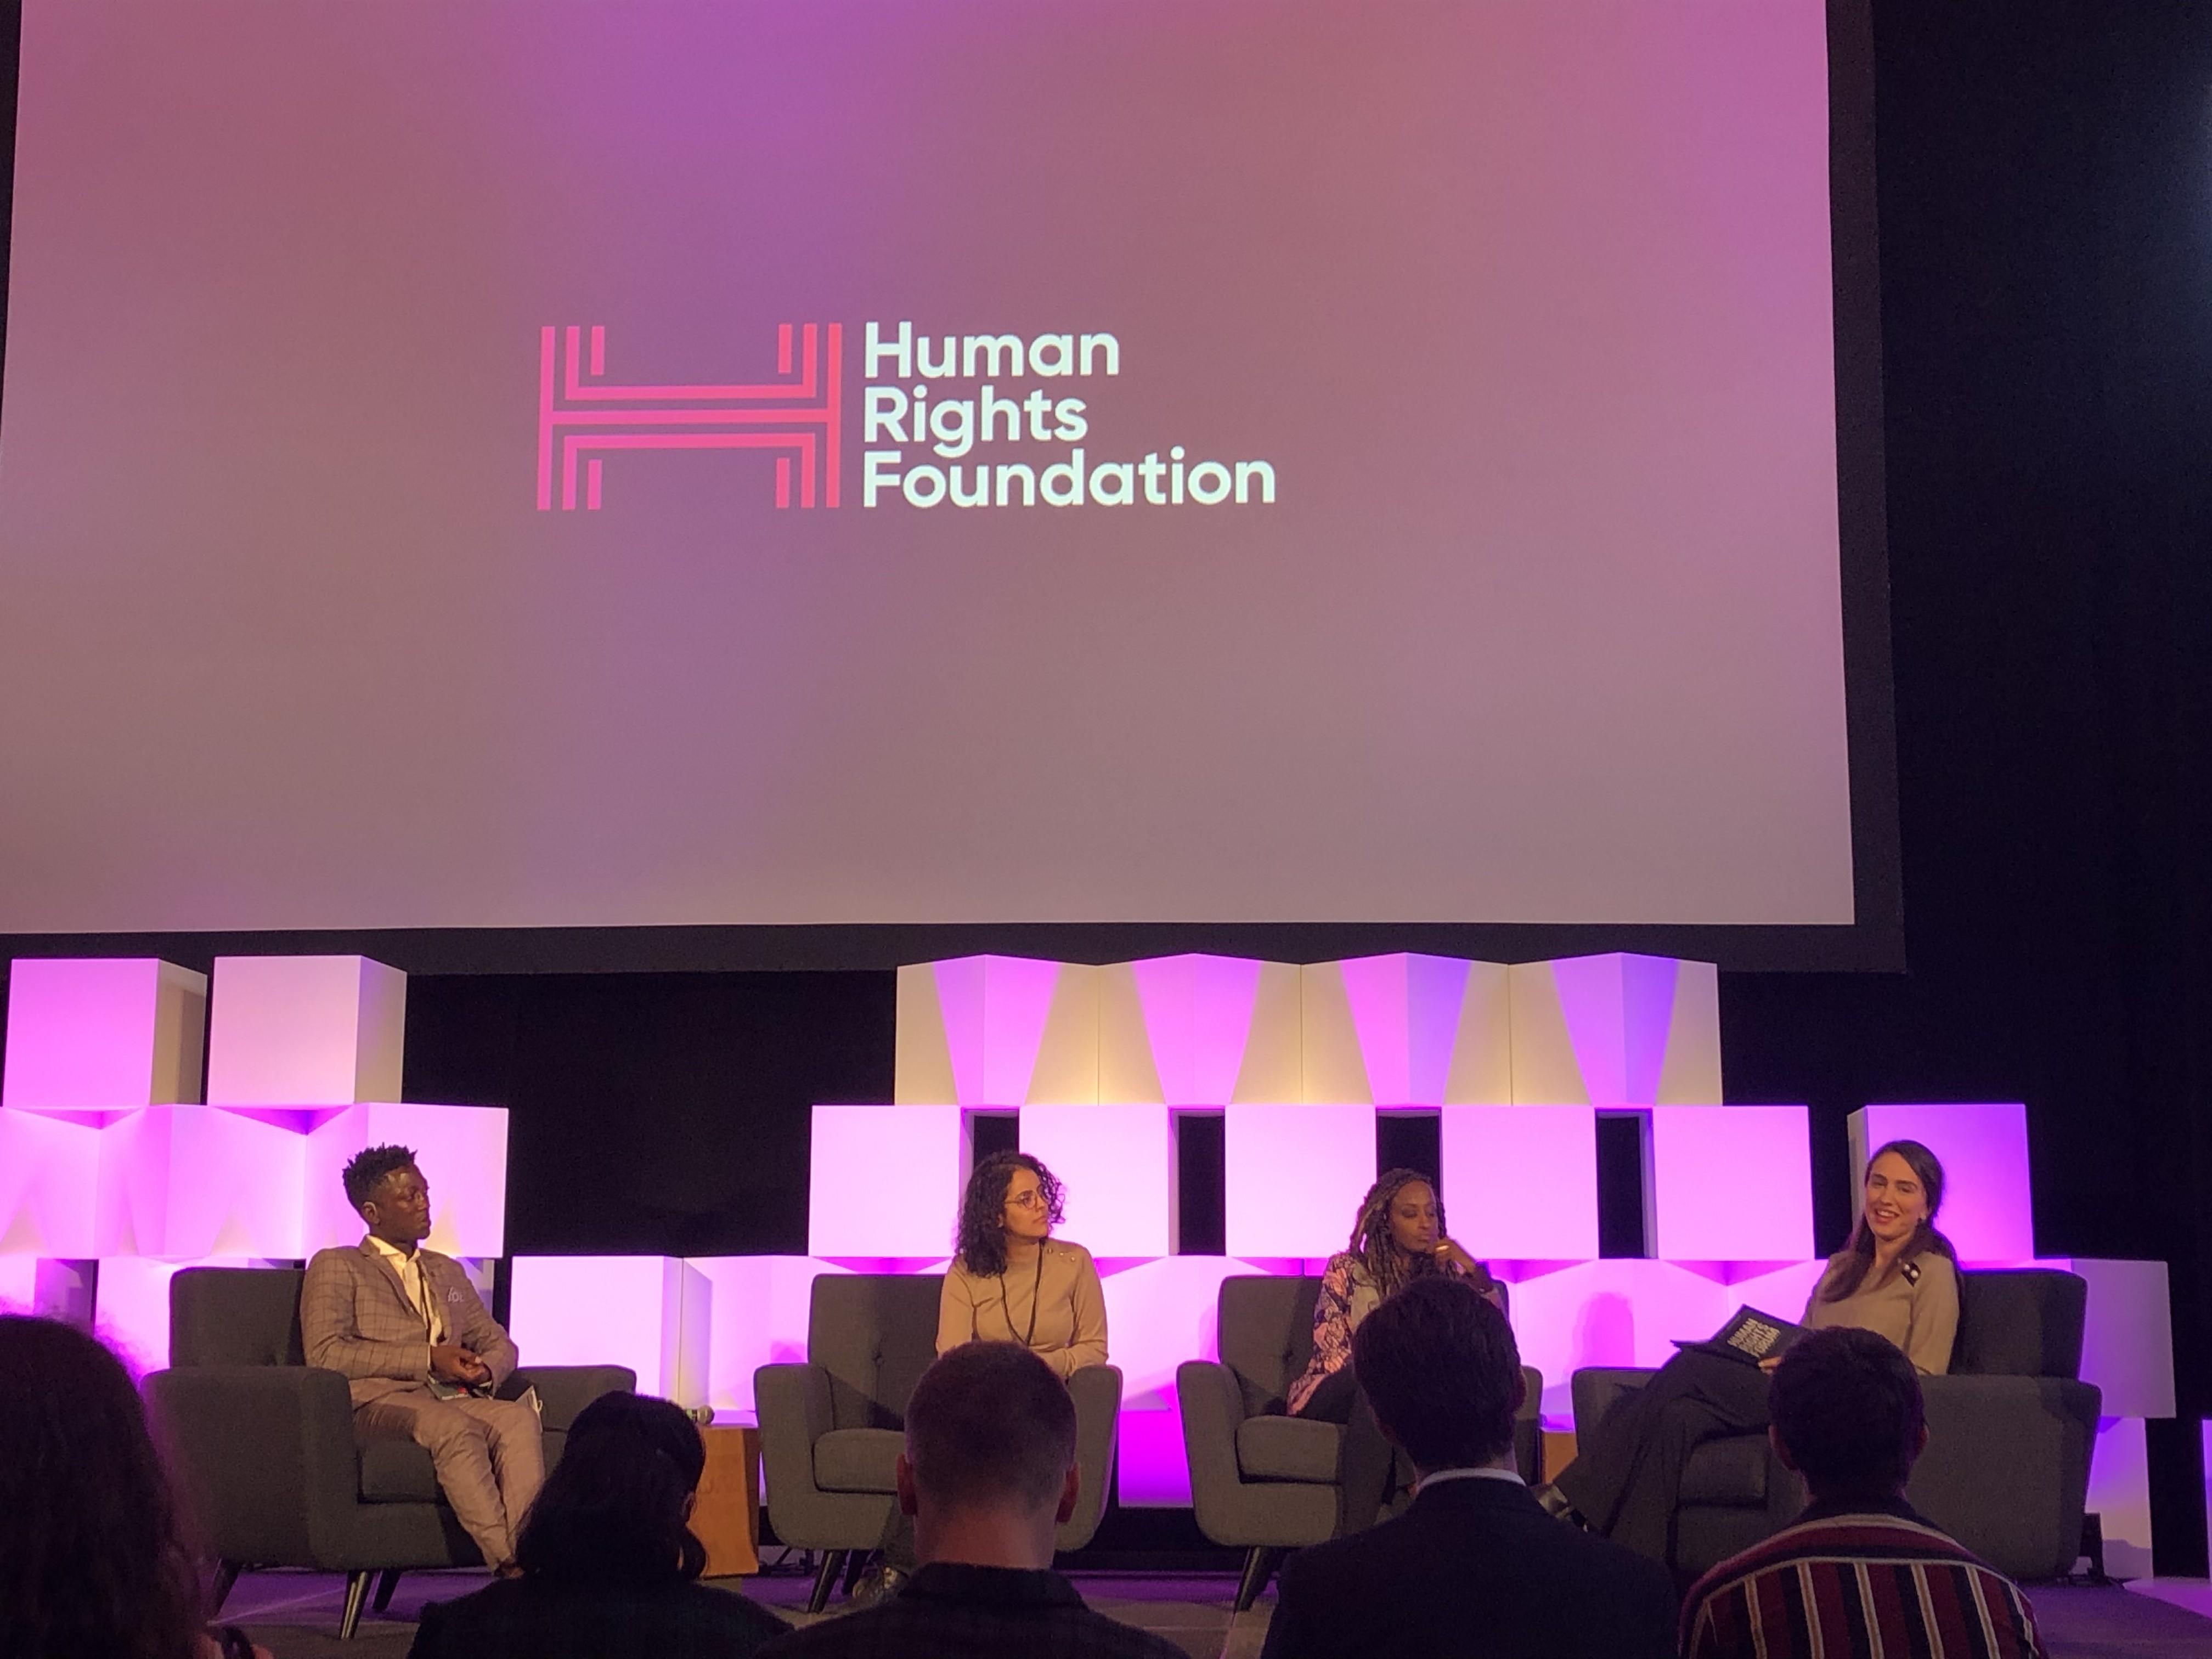 Human Rights Forum Inspires Activists